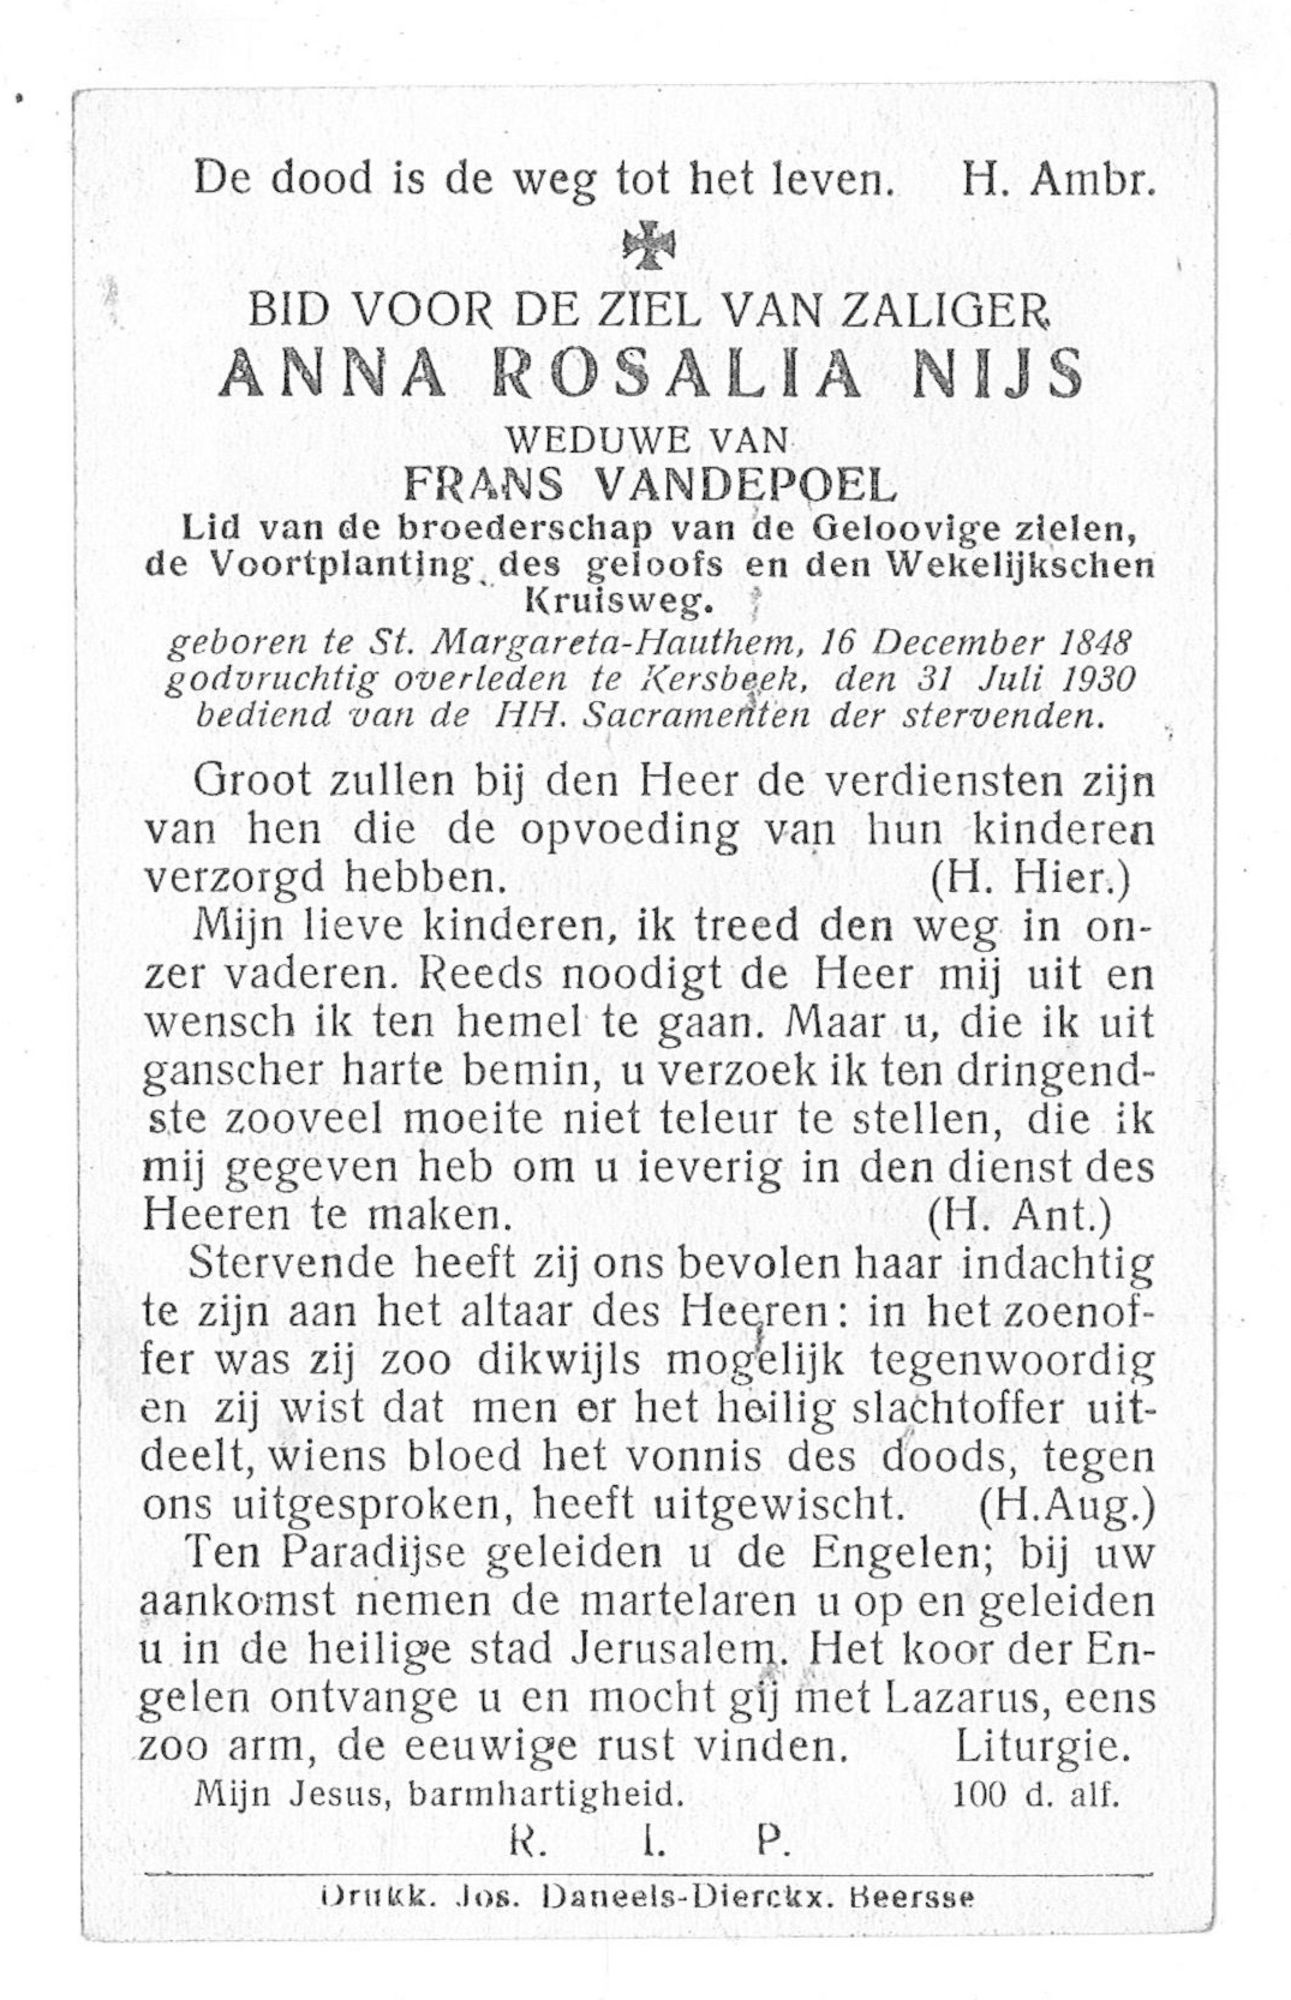 Anna-Rosalia Nijs